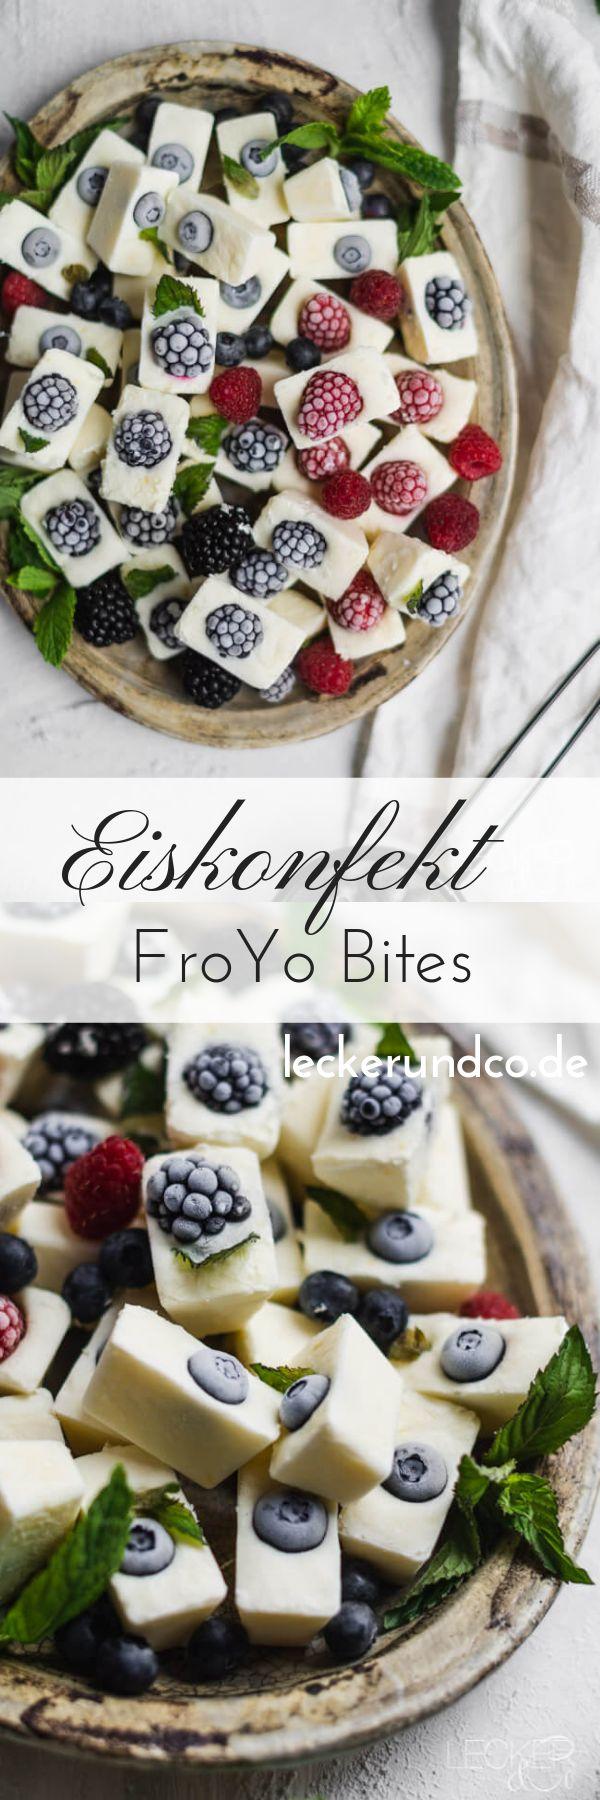 Eiskonfekt | FroYo Bites mit Beeren